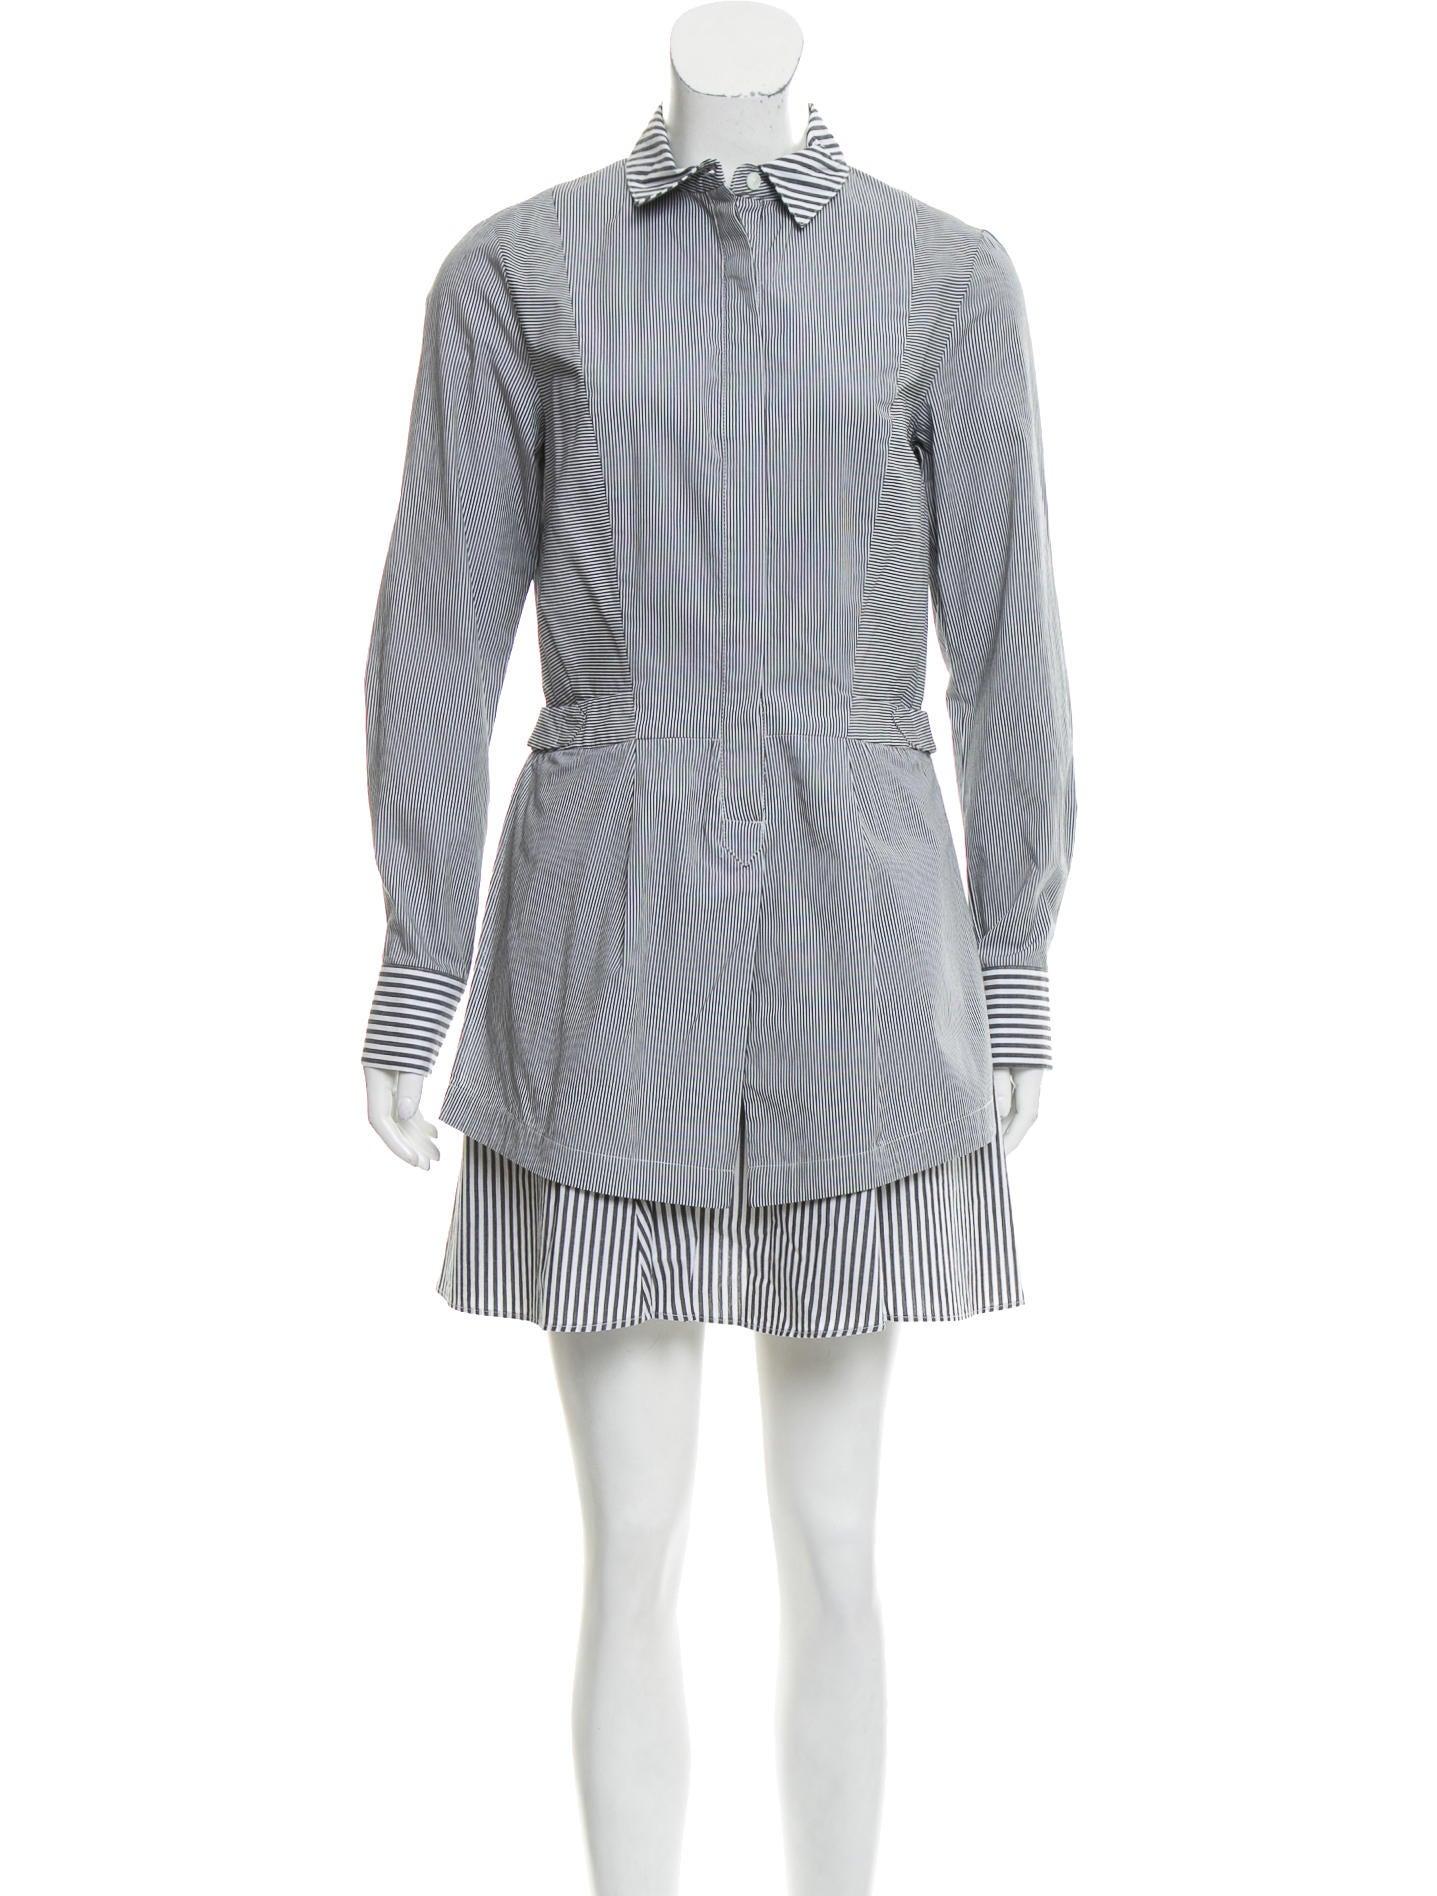 Derek Lam 10 Crosby Striped Button Up Dress Clothing